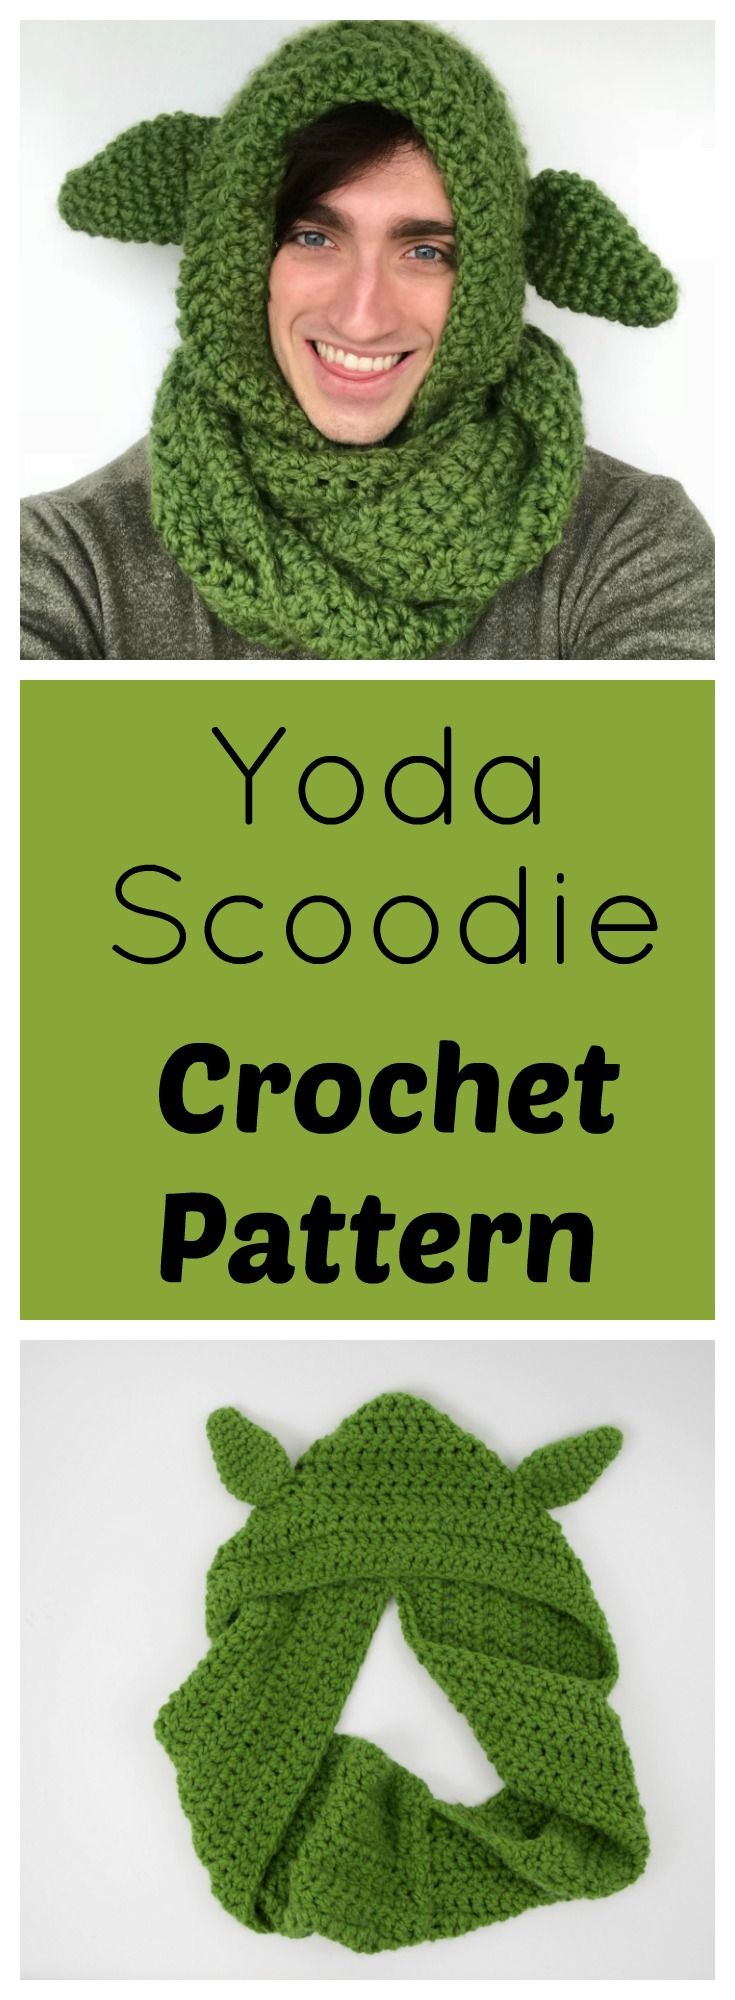 Free Crochet Yoda Scoodie Pattern | Crochet/knit--yarn addict ...